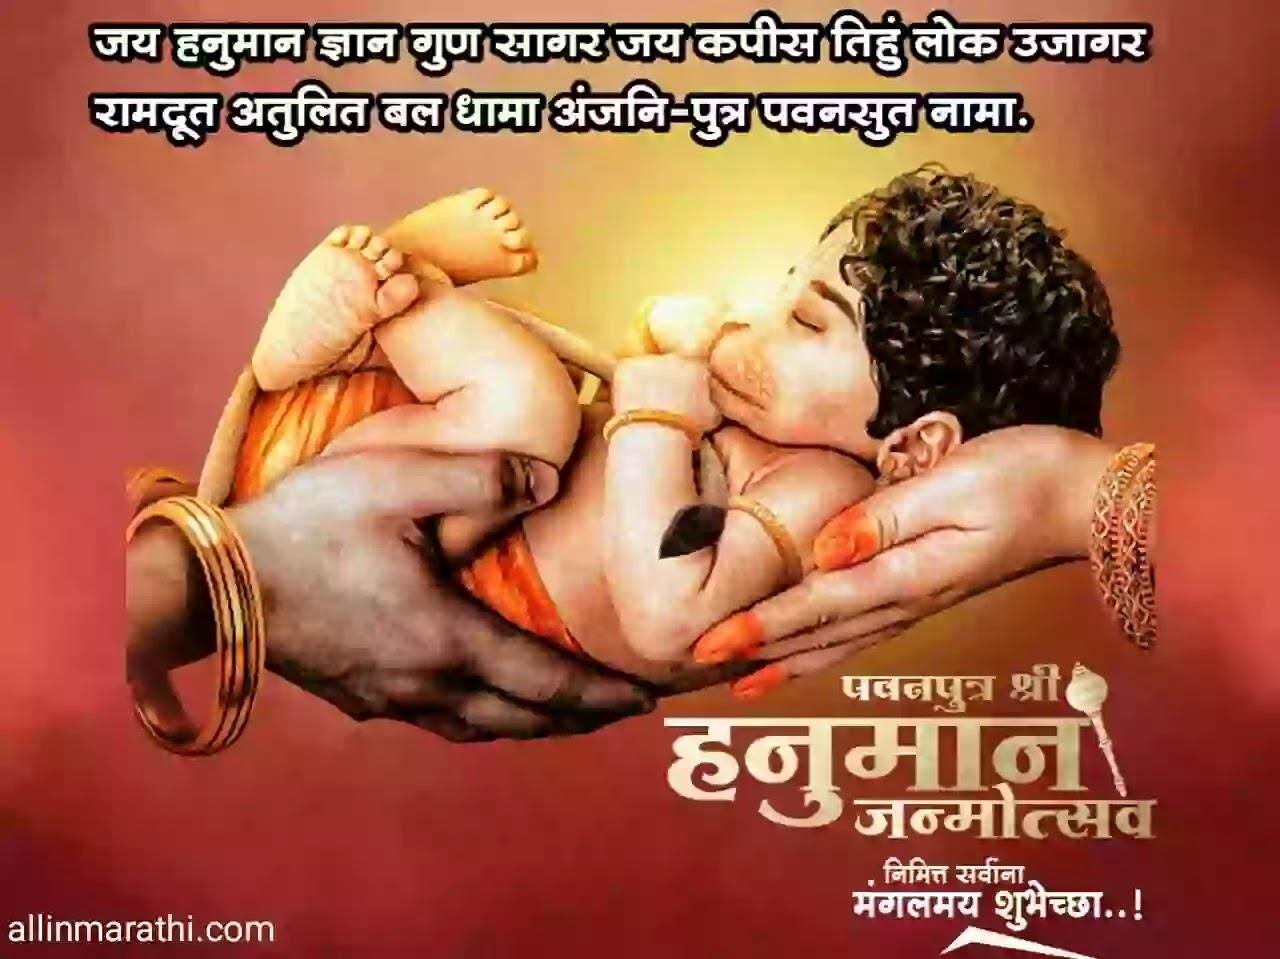 Hanuman-jayanti-status-marathi